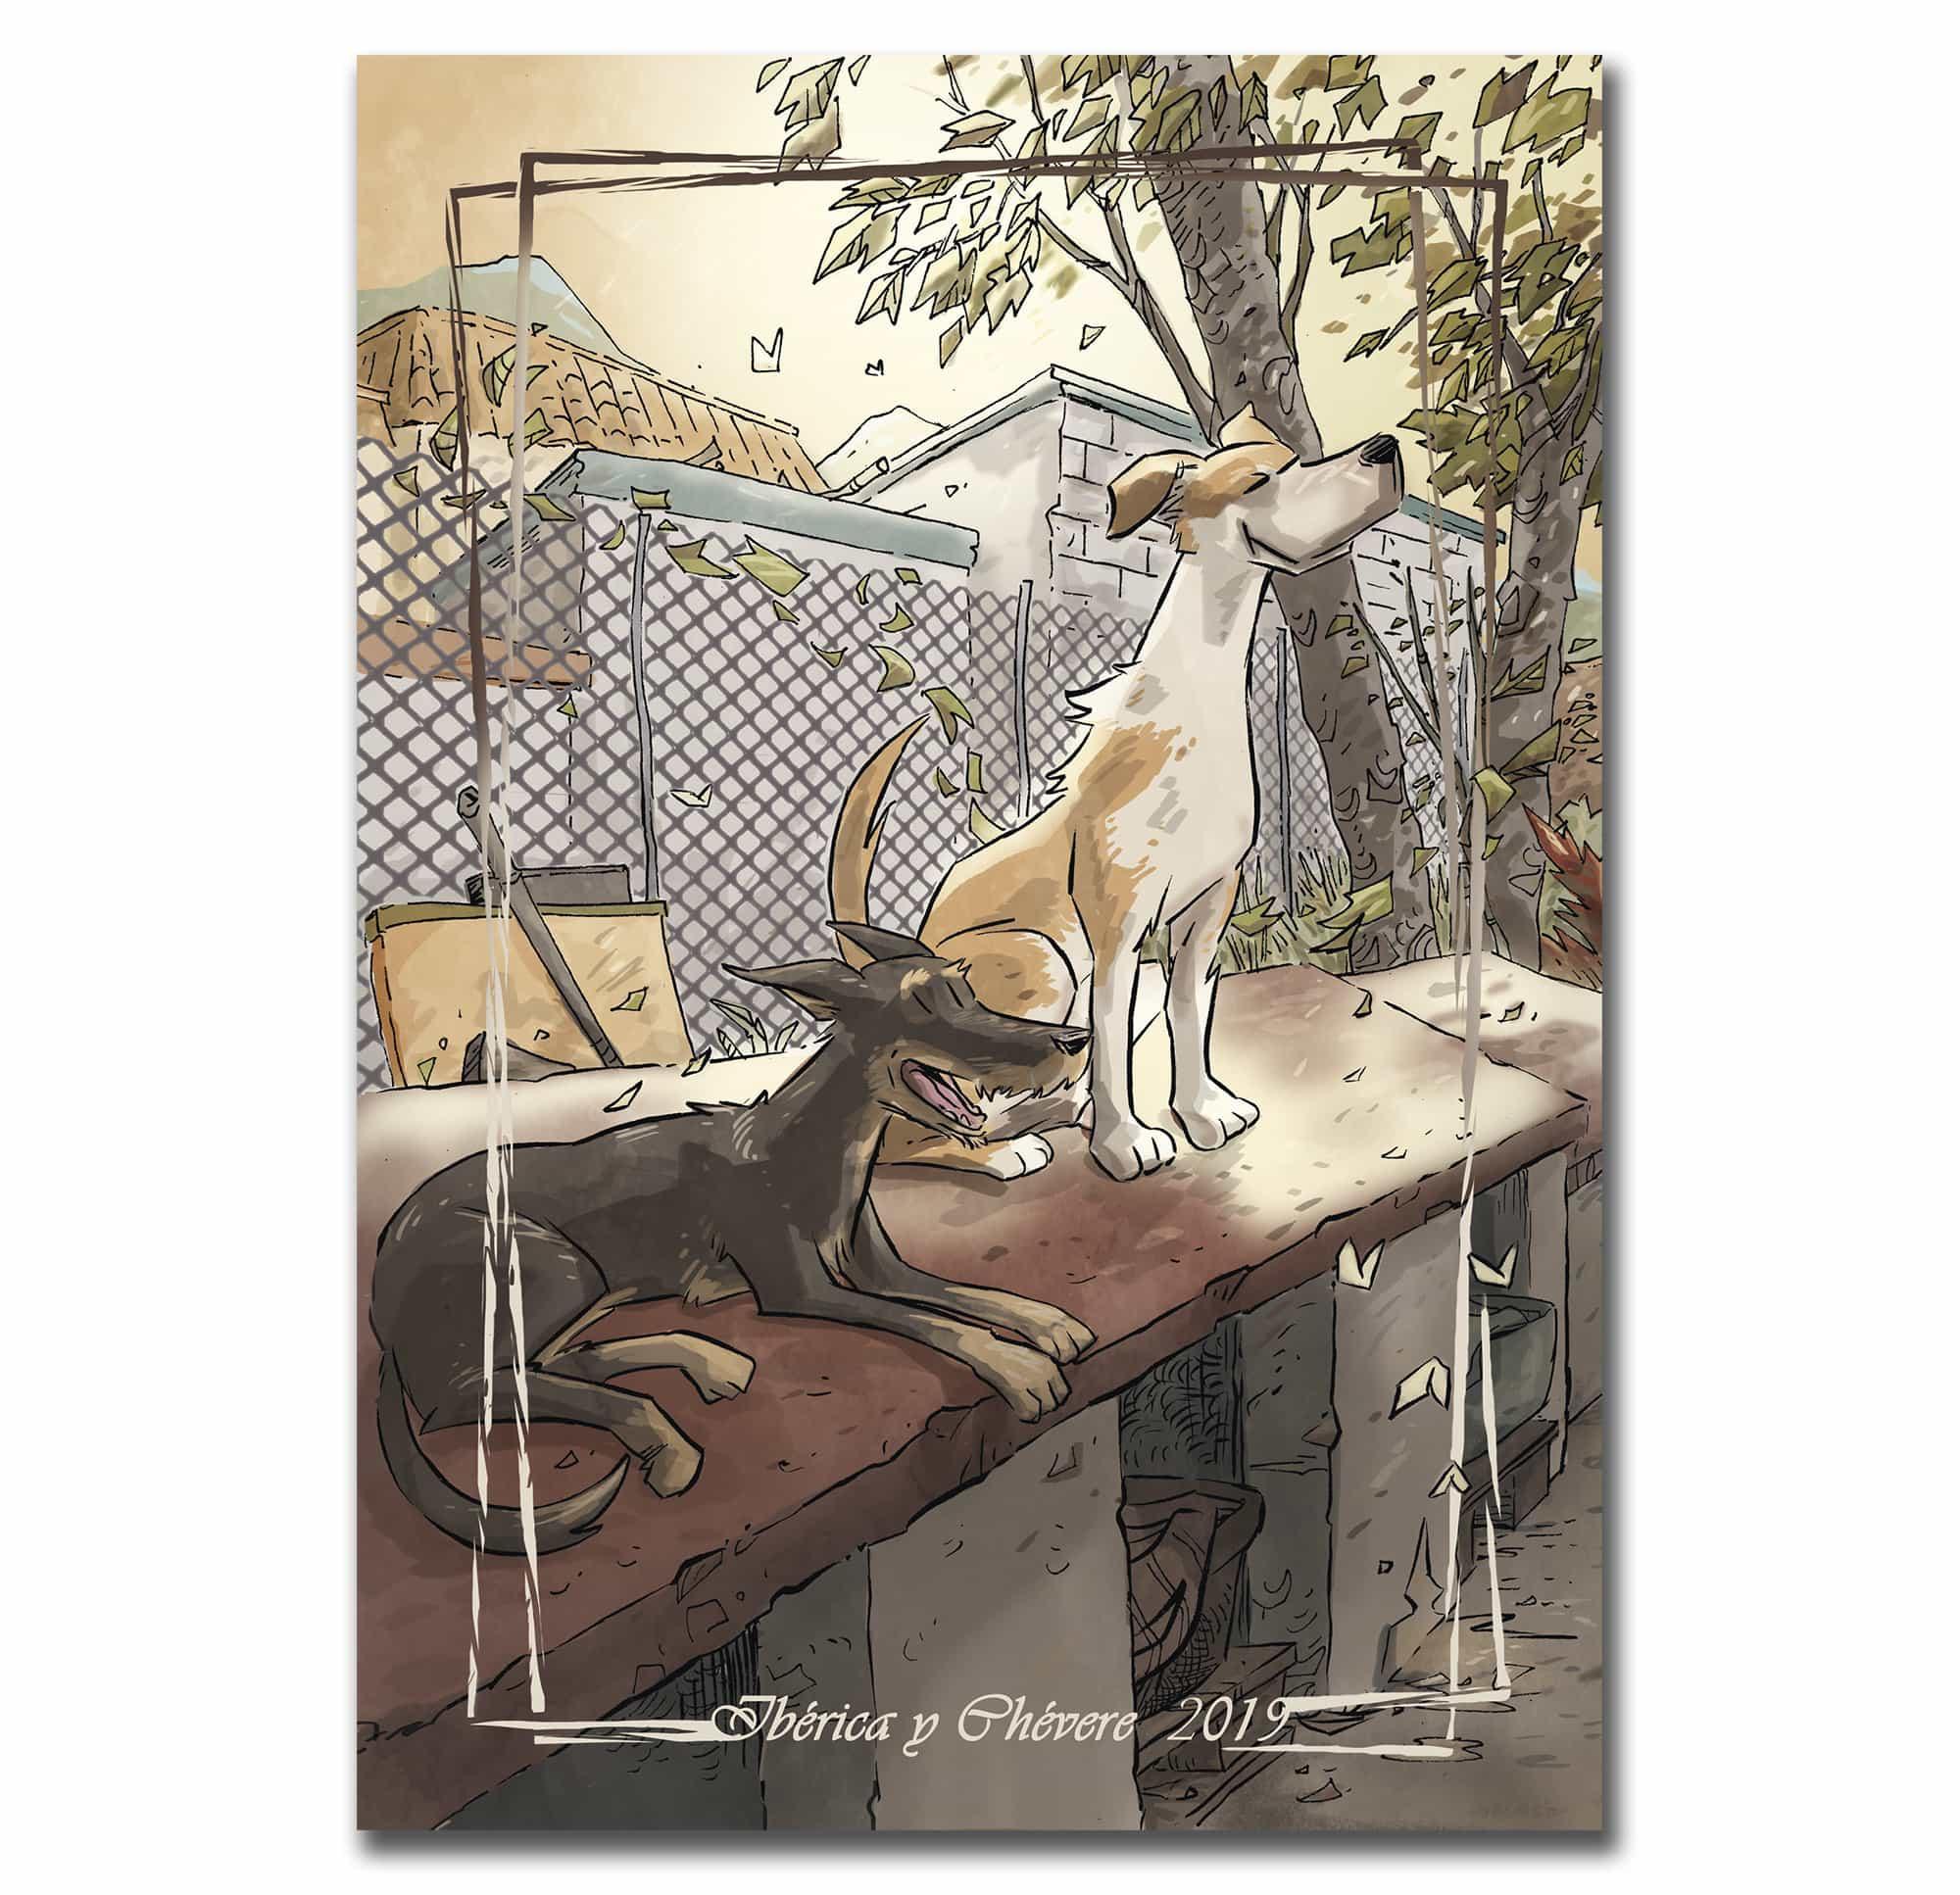 Lámina de Refugio, el cómic de Jose Fonollosa sobre una protectora de animales